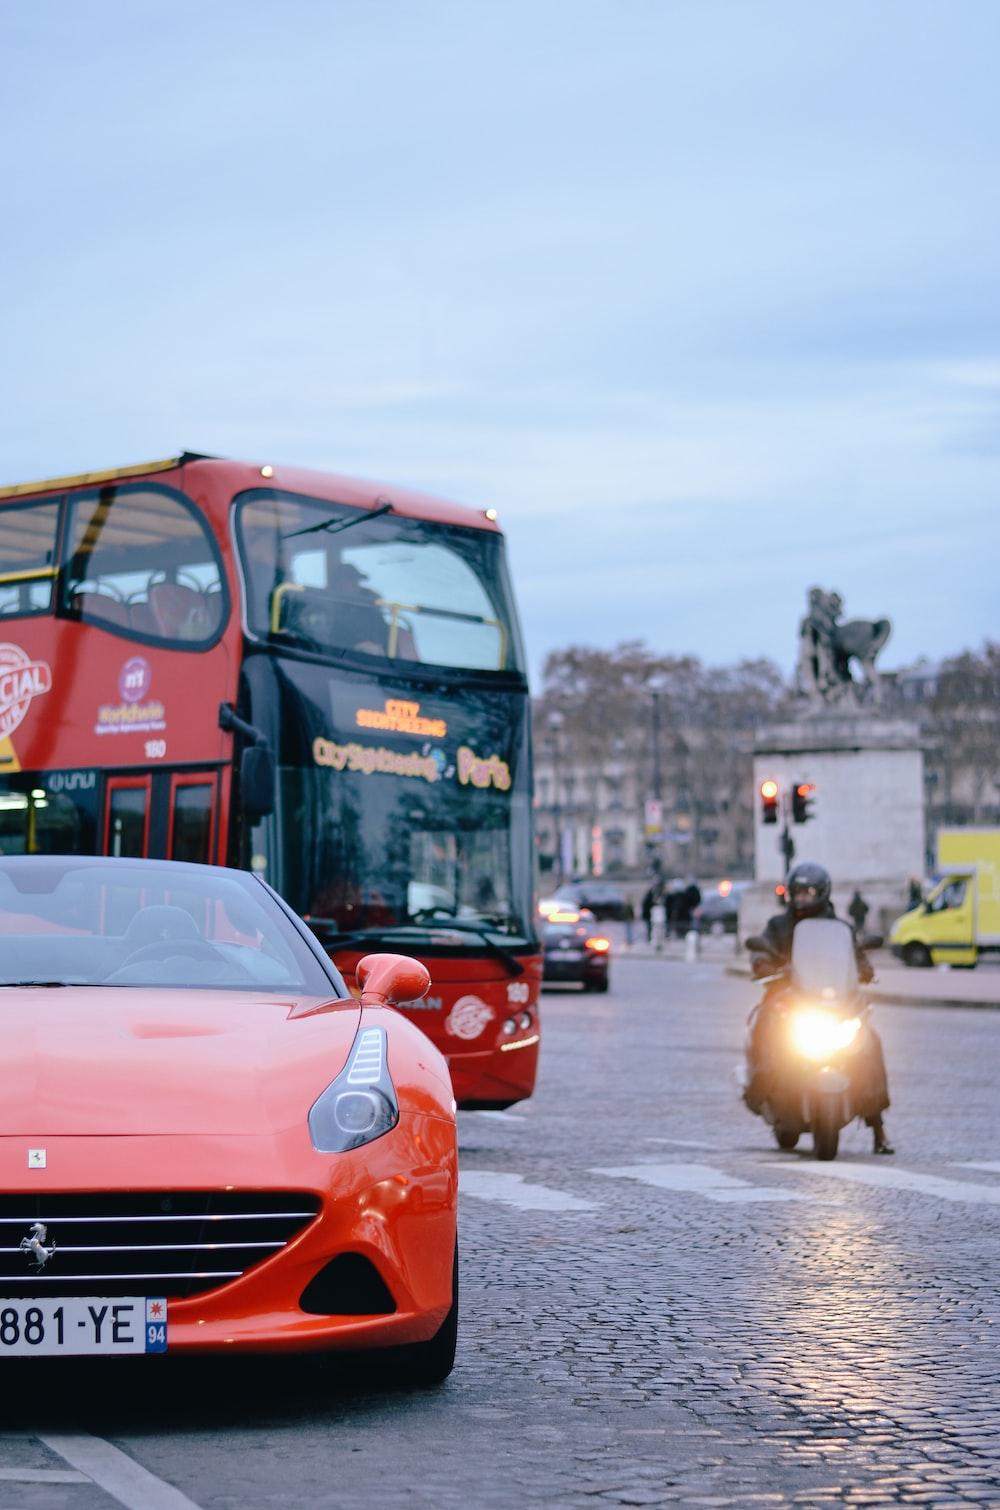 red car beside bus near statue